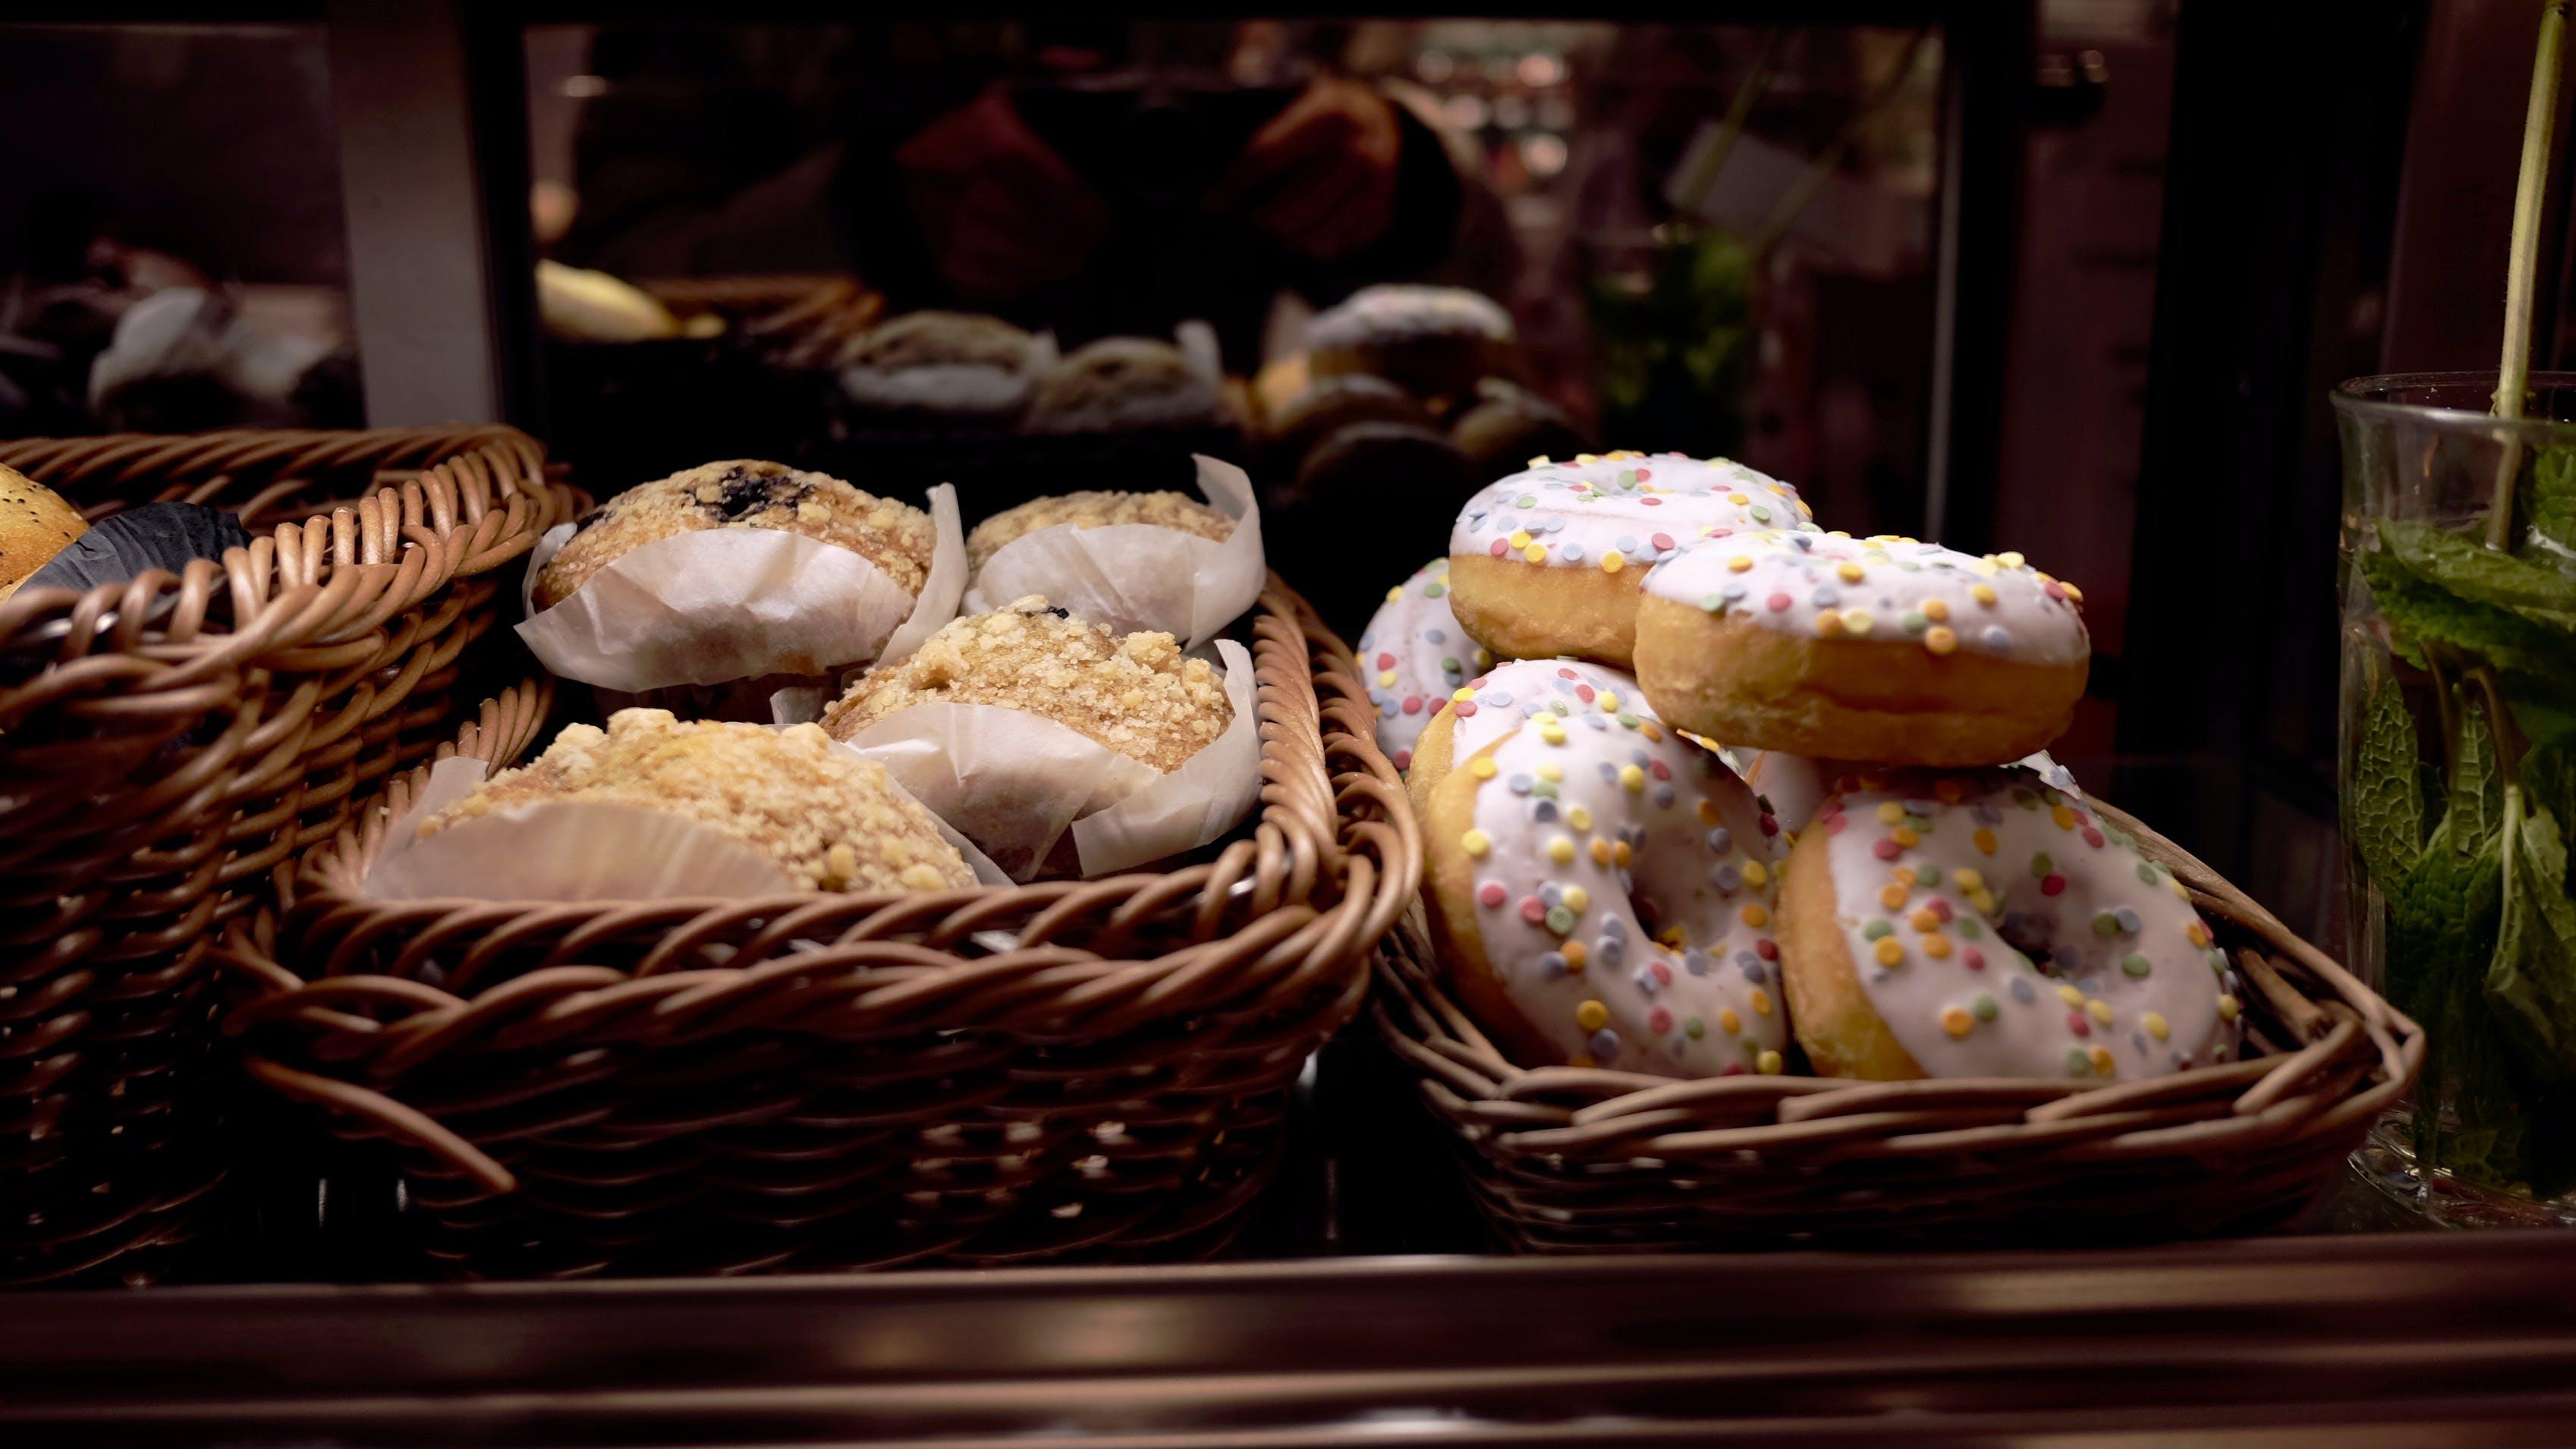 White Topped Doughnut Beside Peanut Cupcake